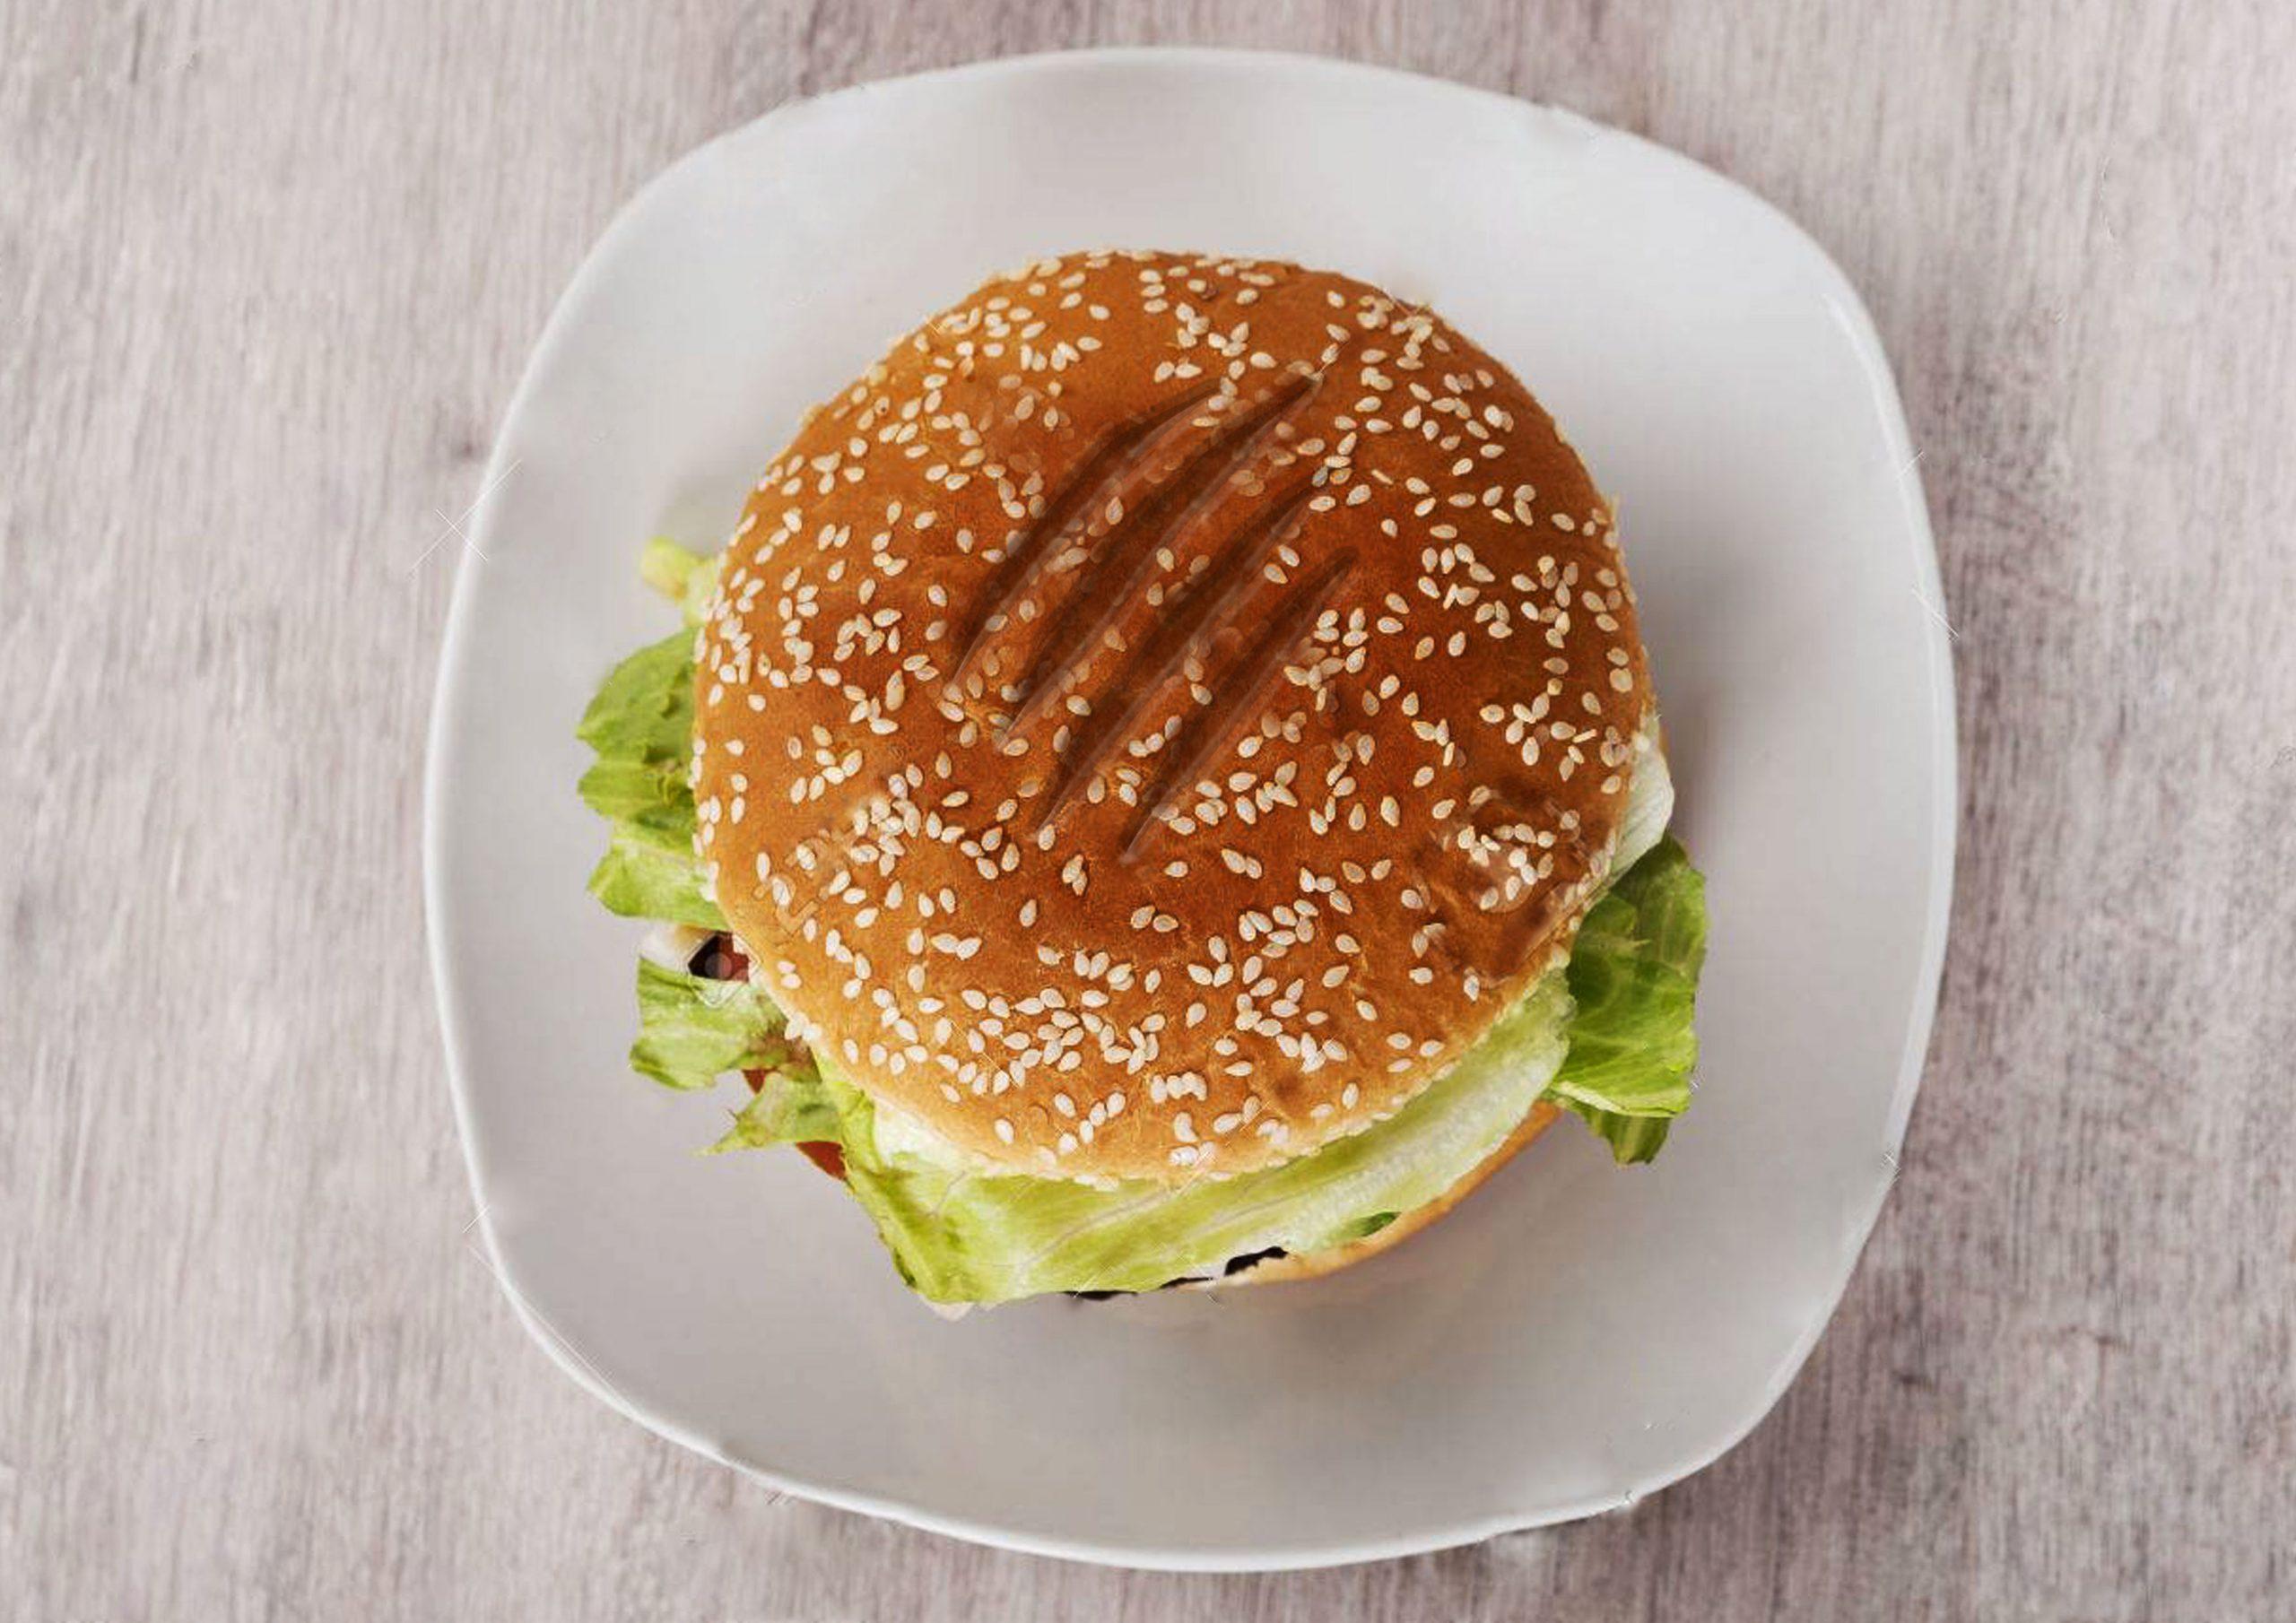 Firezilla Burger Stamp